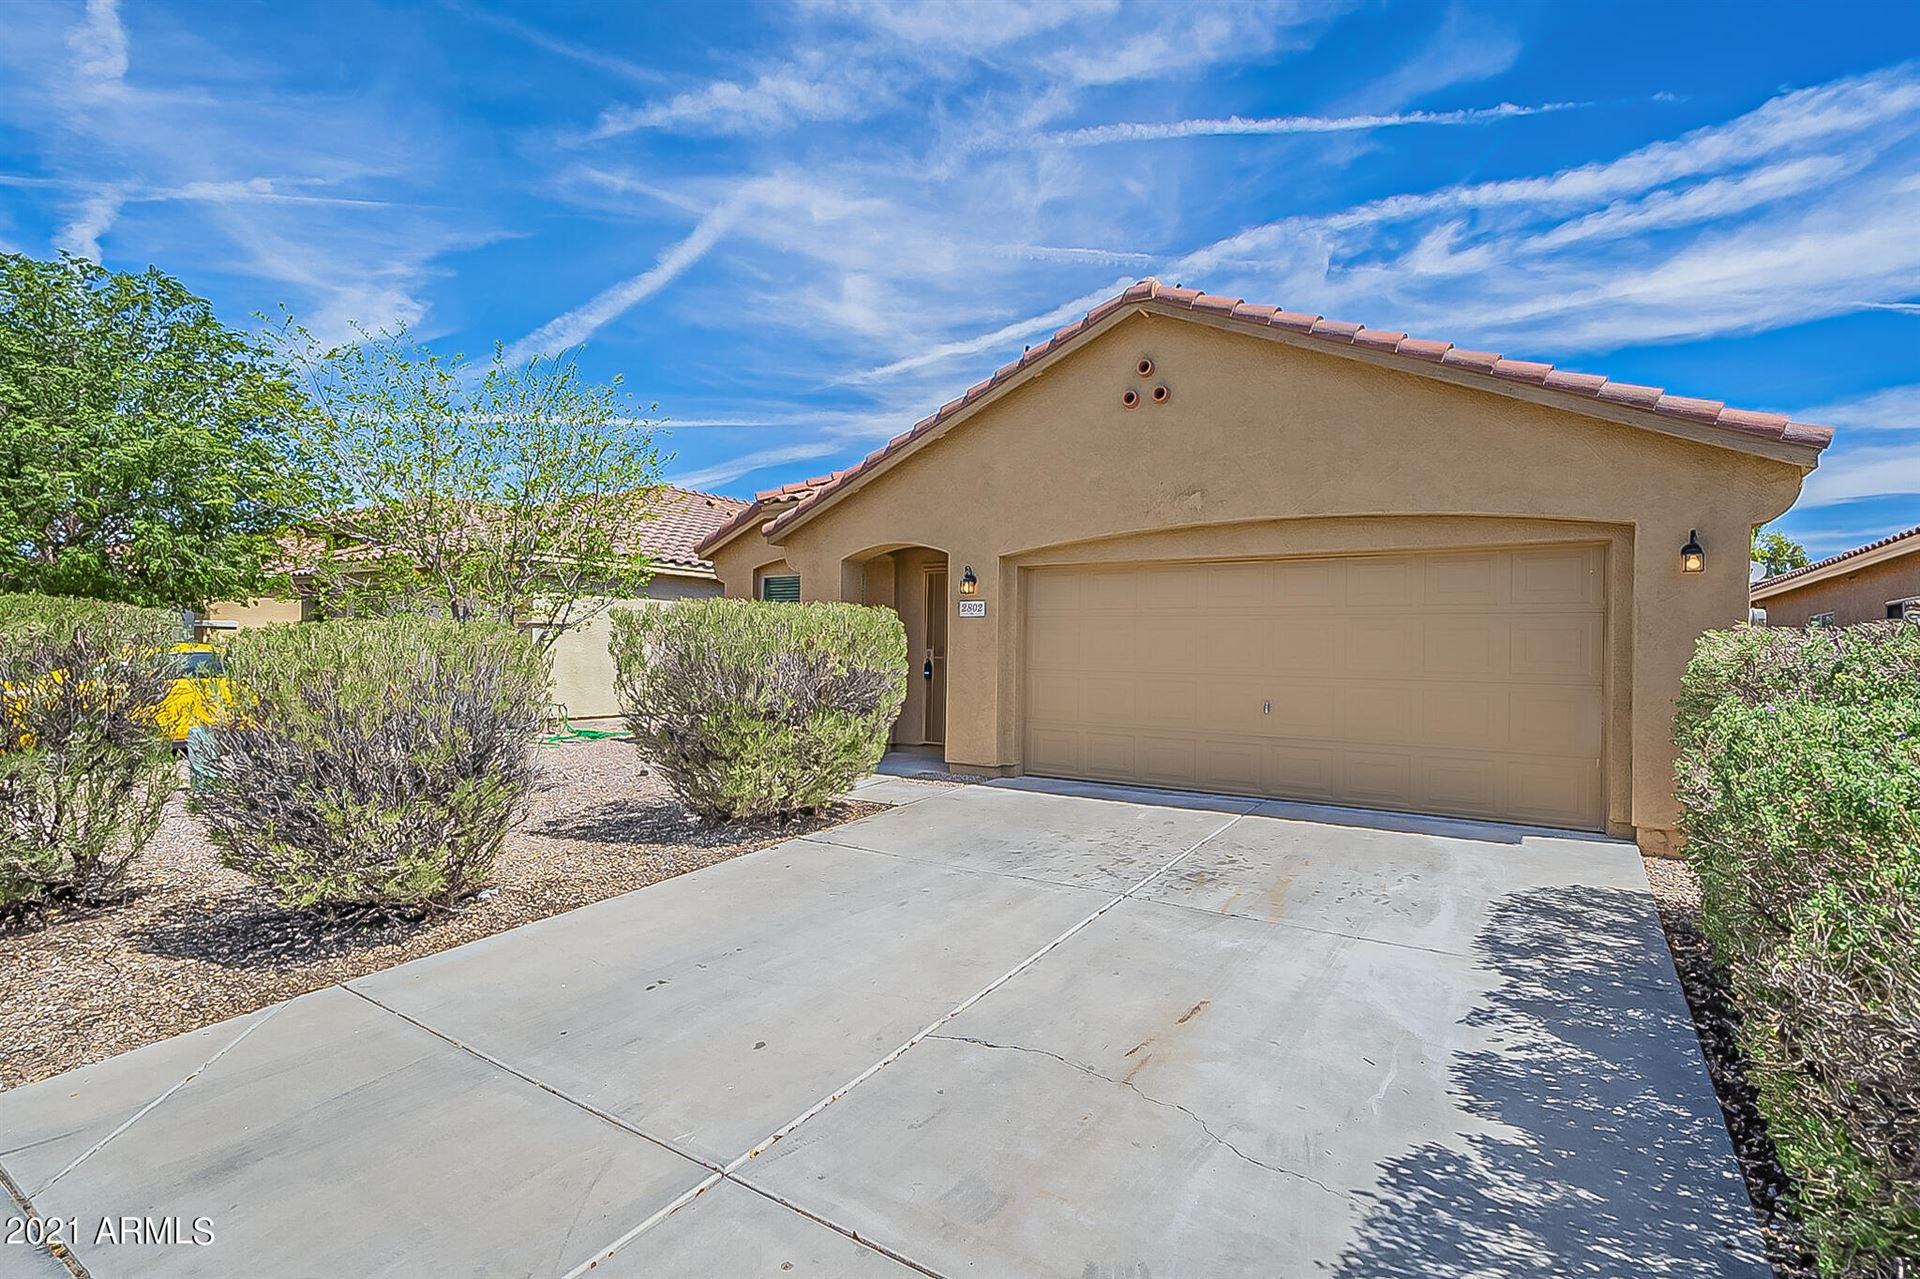 Photo of 2802 W SANTA CRUZ Avenue, Queen Creek, AZ 85142 (MLS # 6249193)